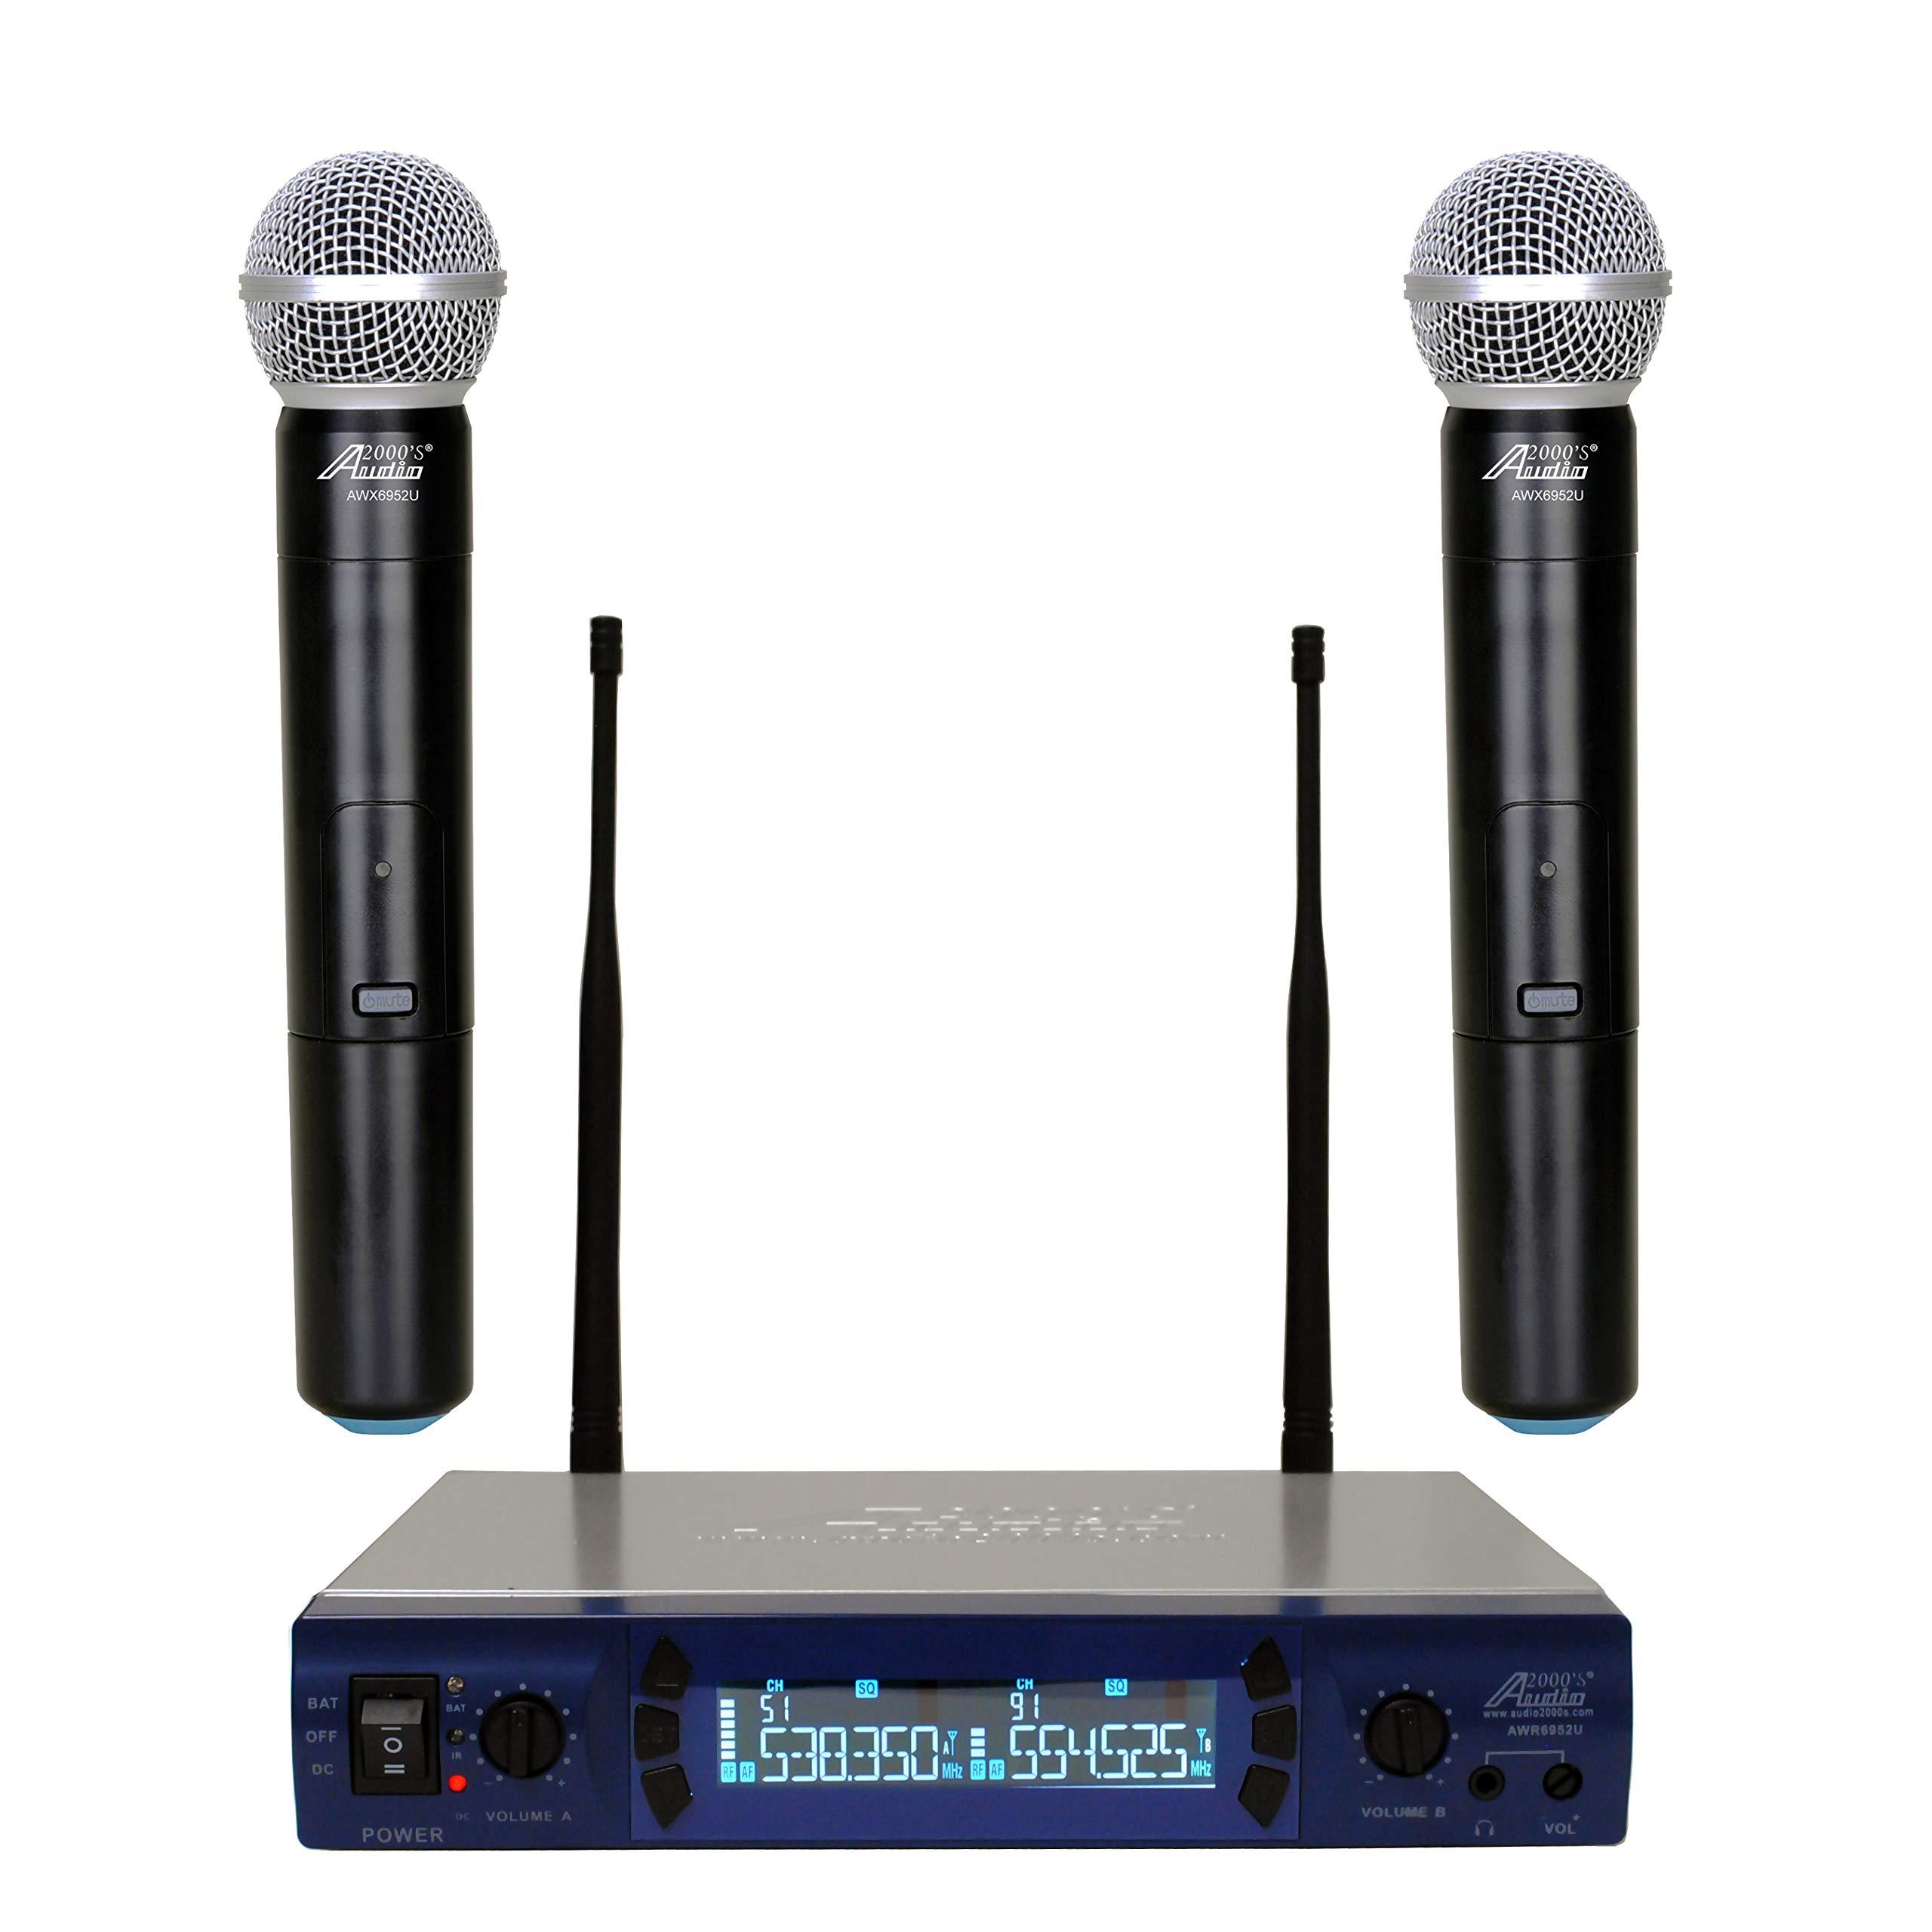 Audio AWM 6952U Handheld Frequencies Microphone